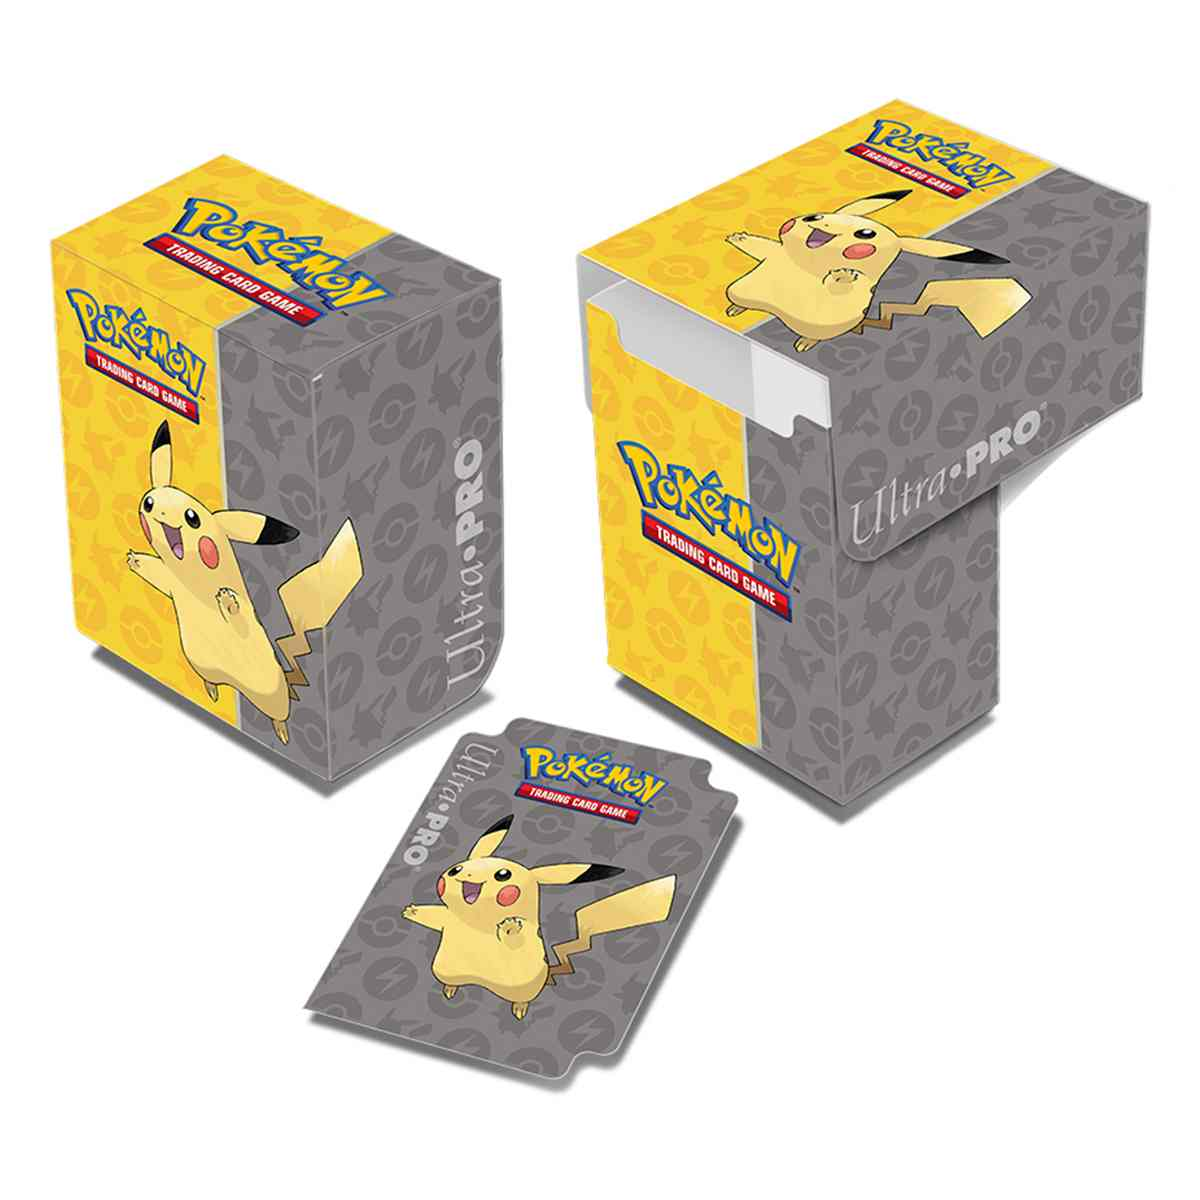 Deck Box Pokemon Pikachu Ultra Pro